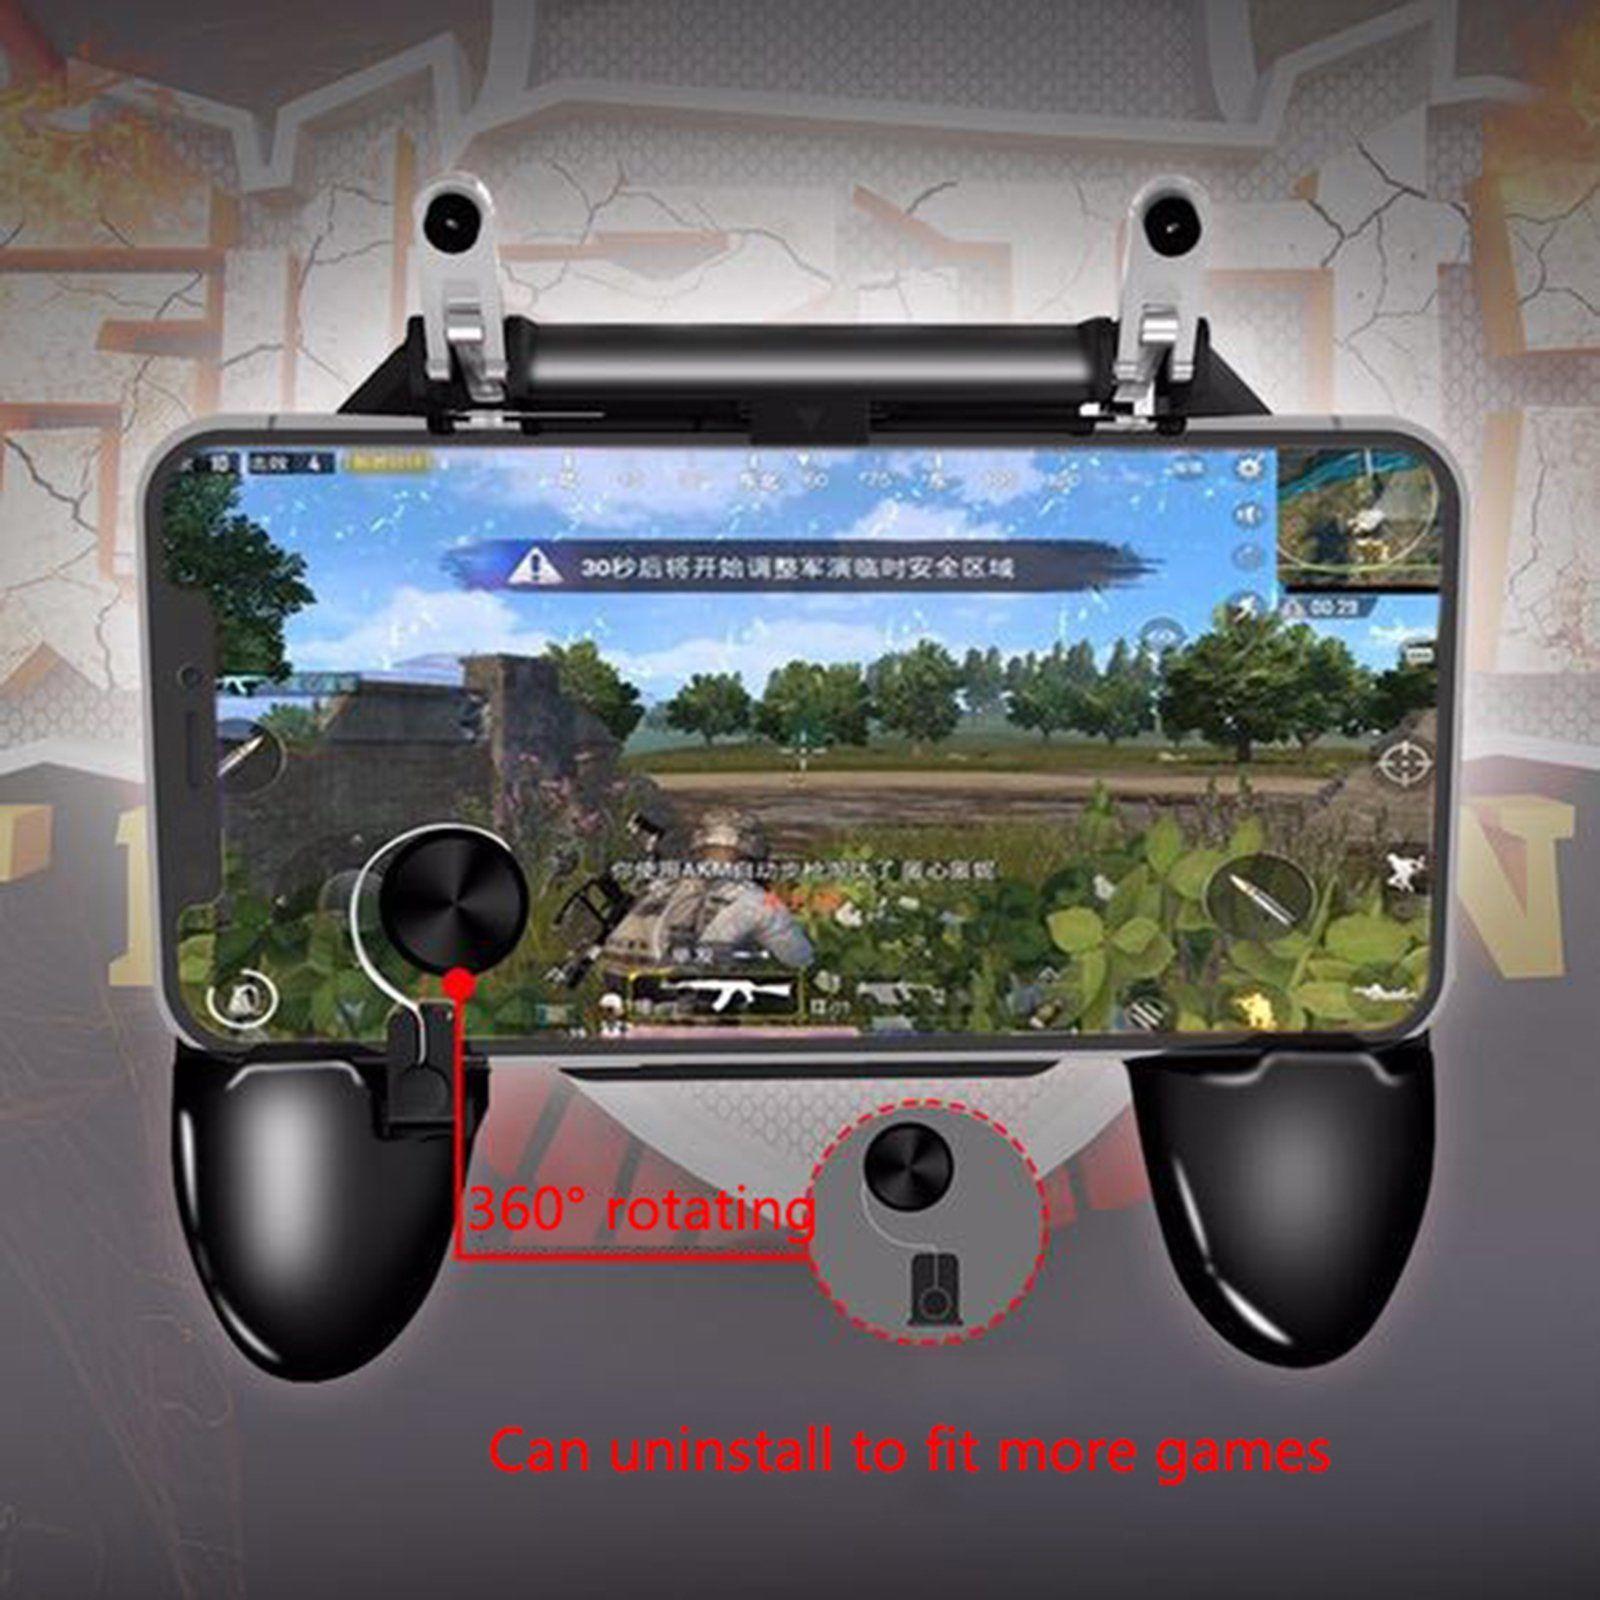 Bộ tay cầm 3in1 kèm nút di chuyển nút chơi game PUBG ROS Freefire W11+